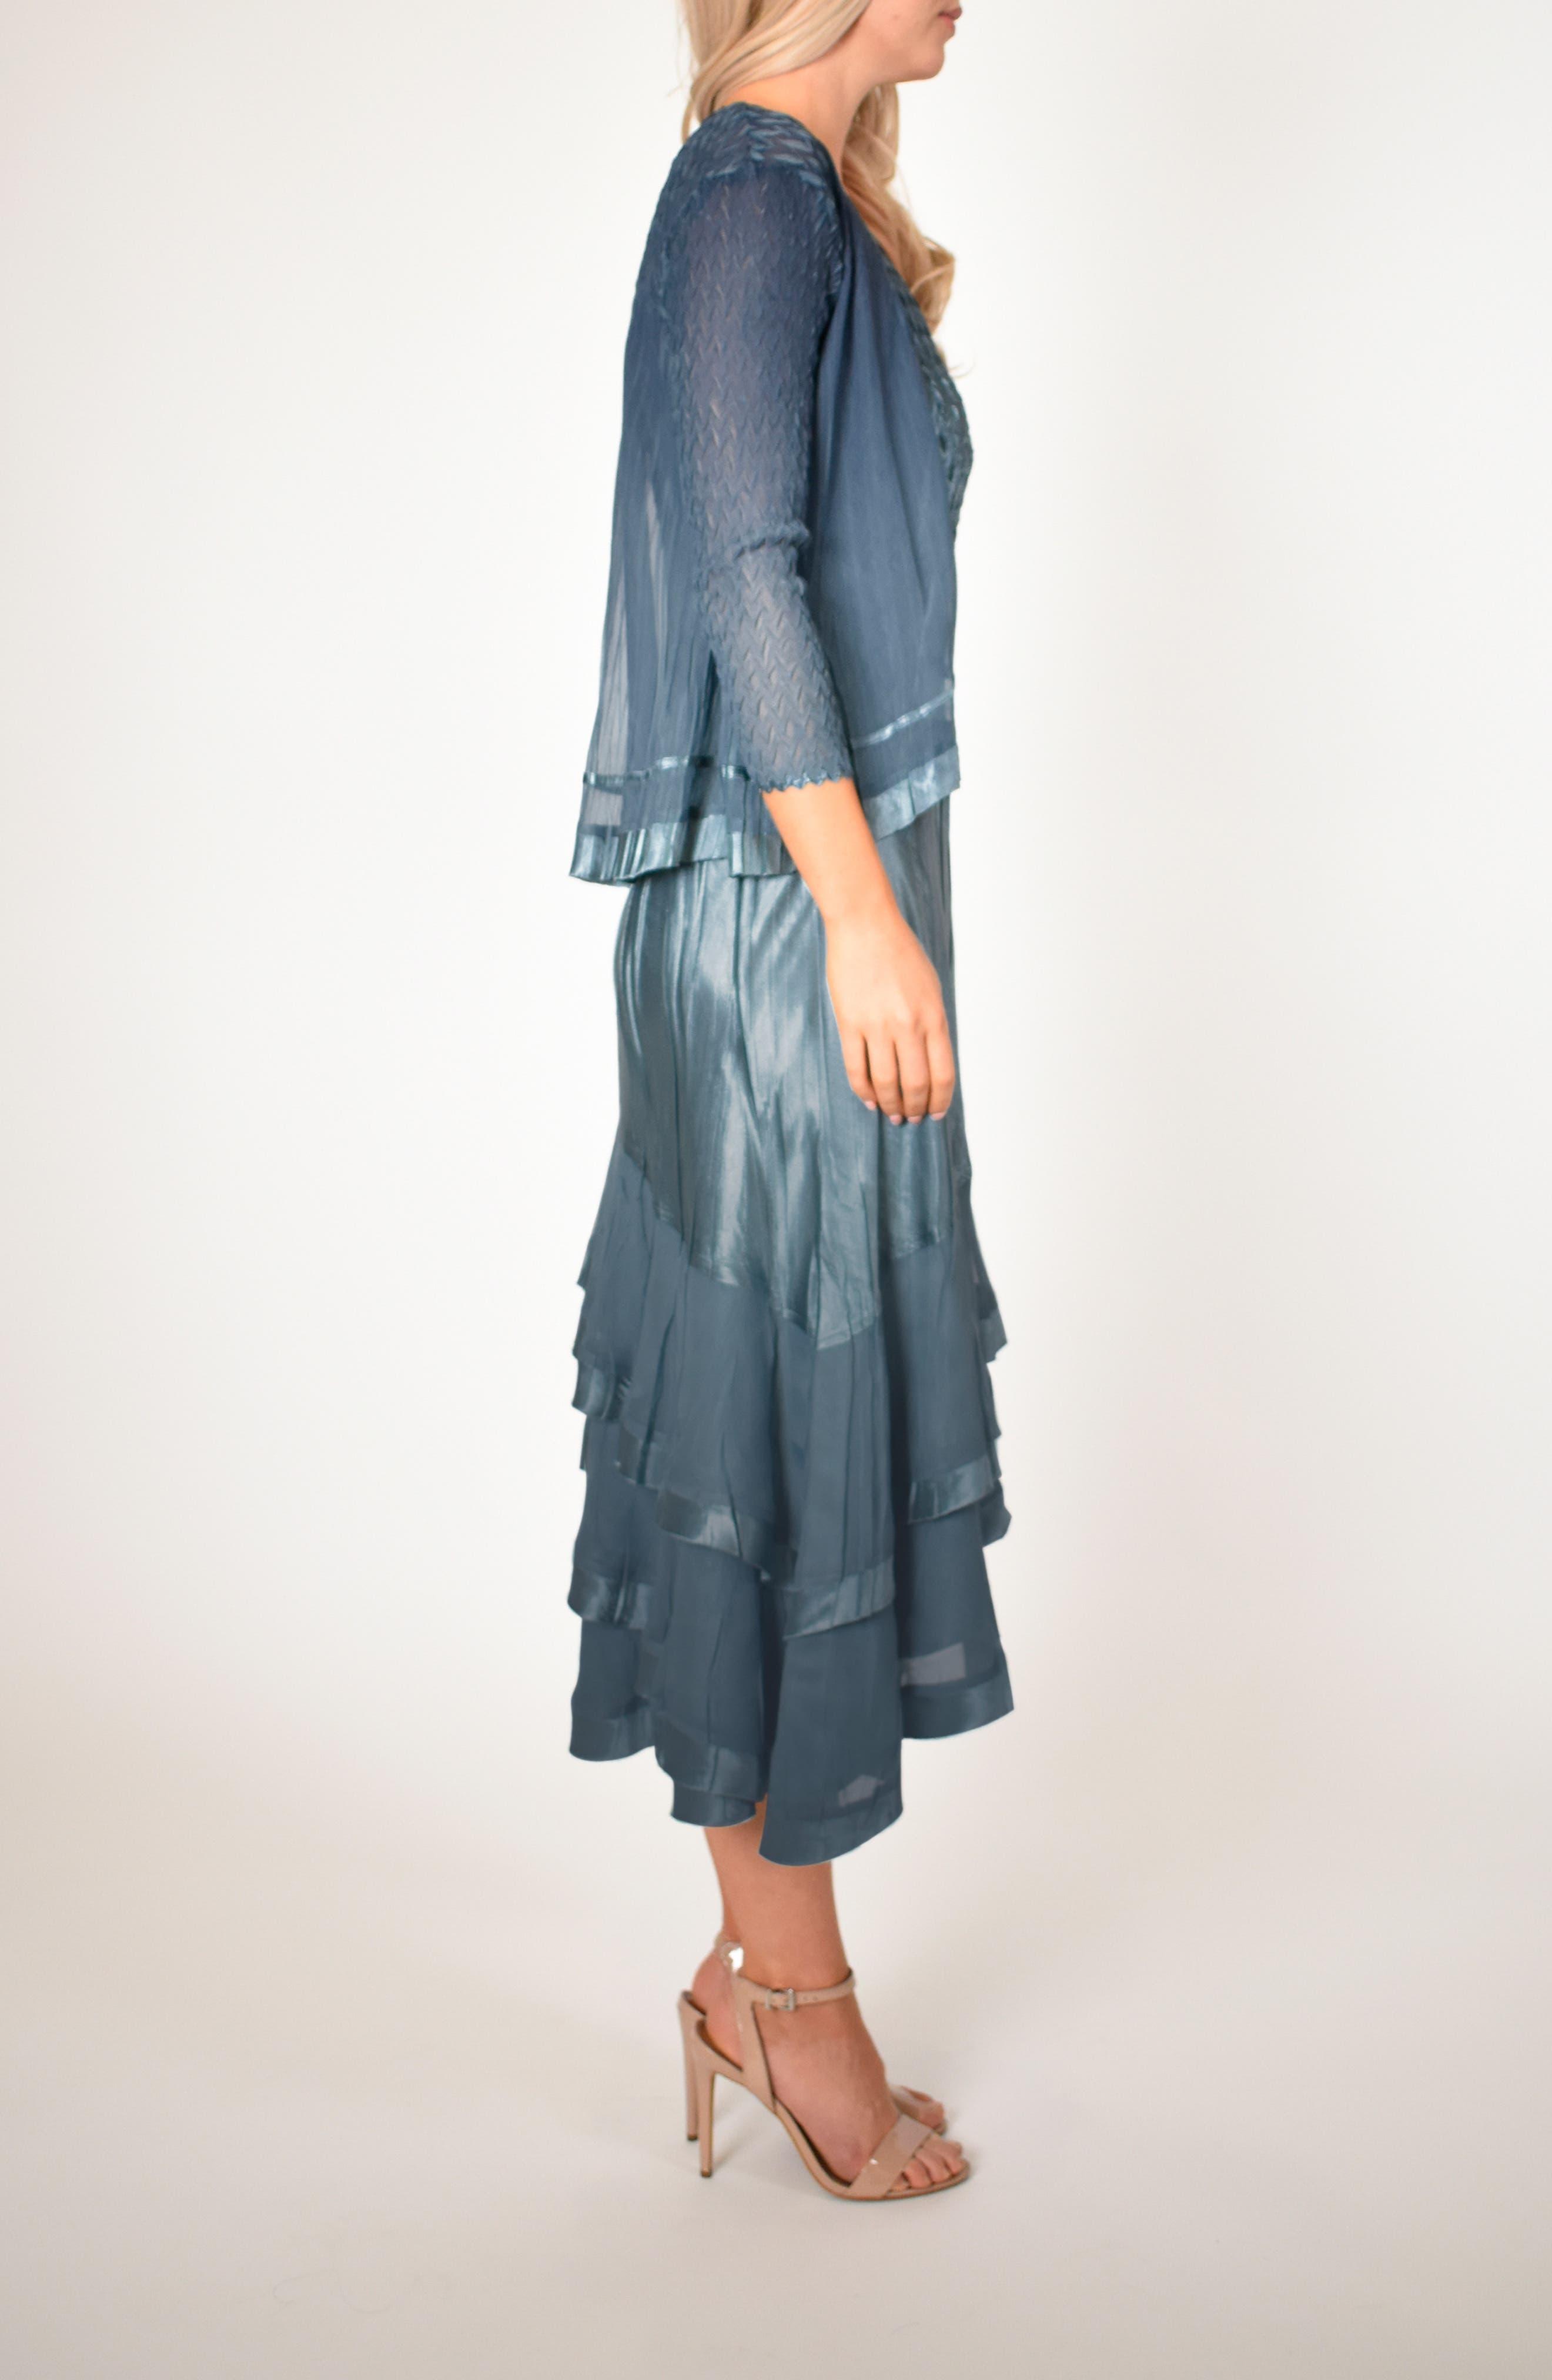 KOMAROV, Asymmetrical Jacket Dress, Alternate thumbnail 7, color, SILVER BLUE NIGHT OMBRE